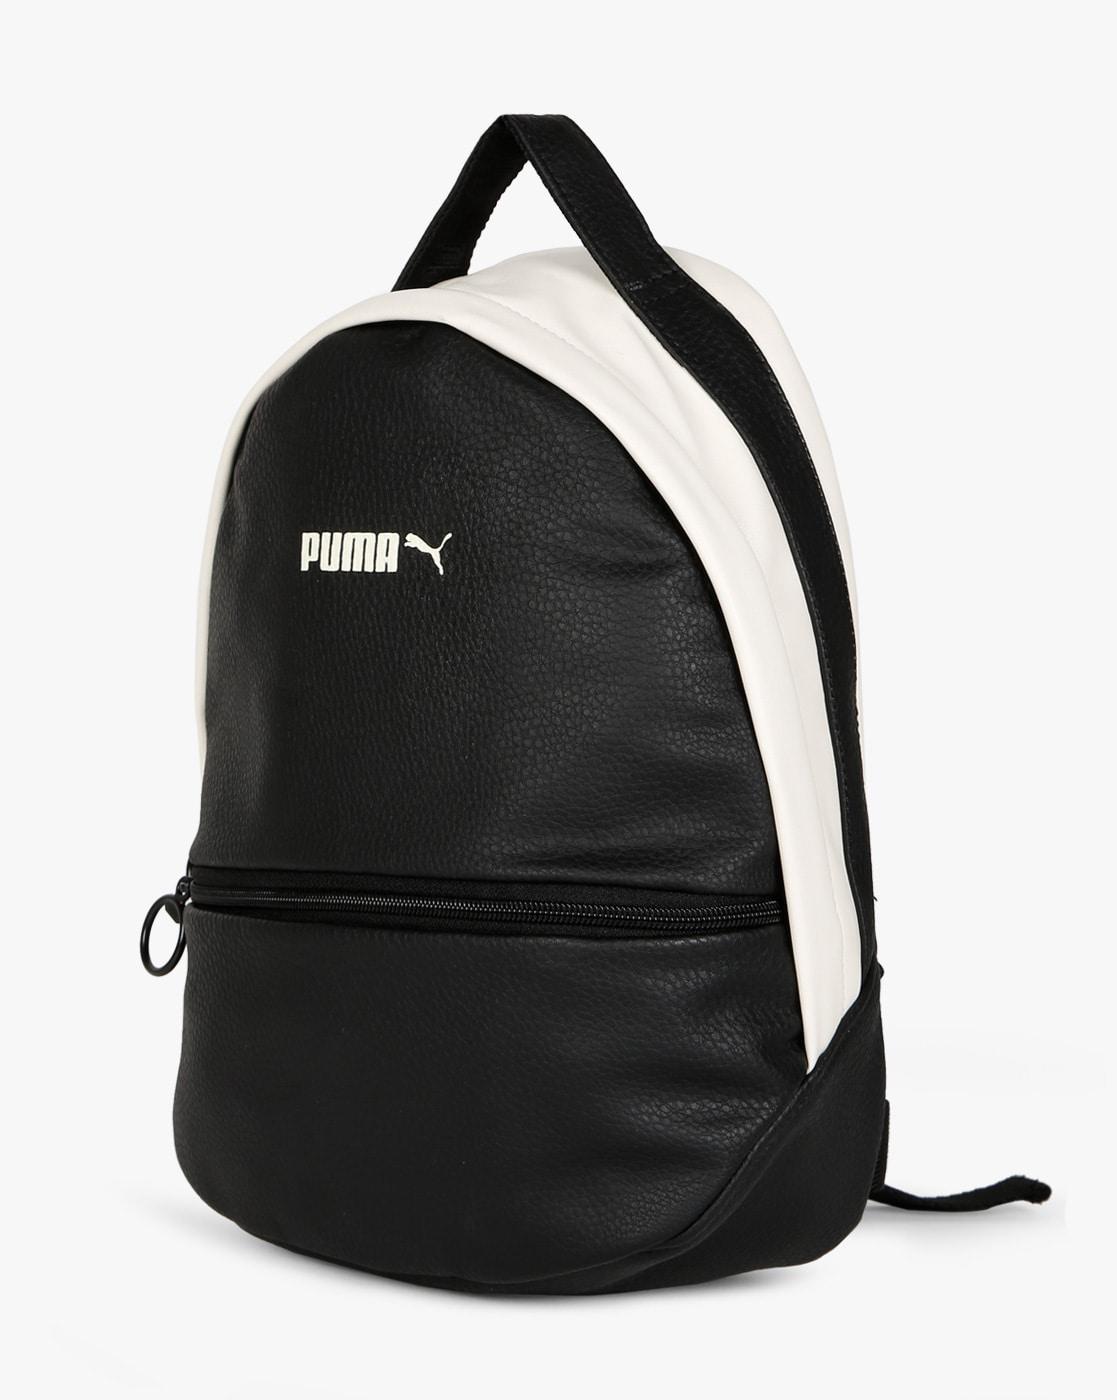 19e8a0937b Buy Black & White Backpacks for Women by Puma Online | Ajio.com